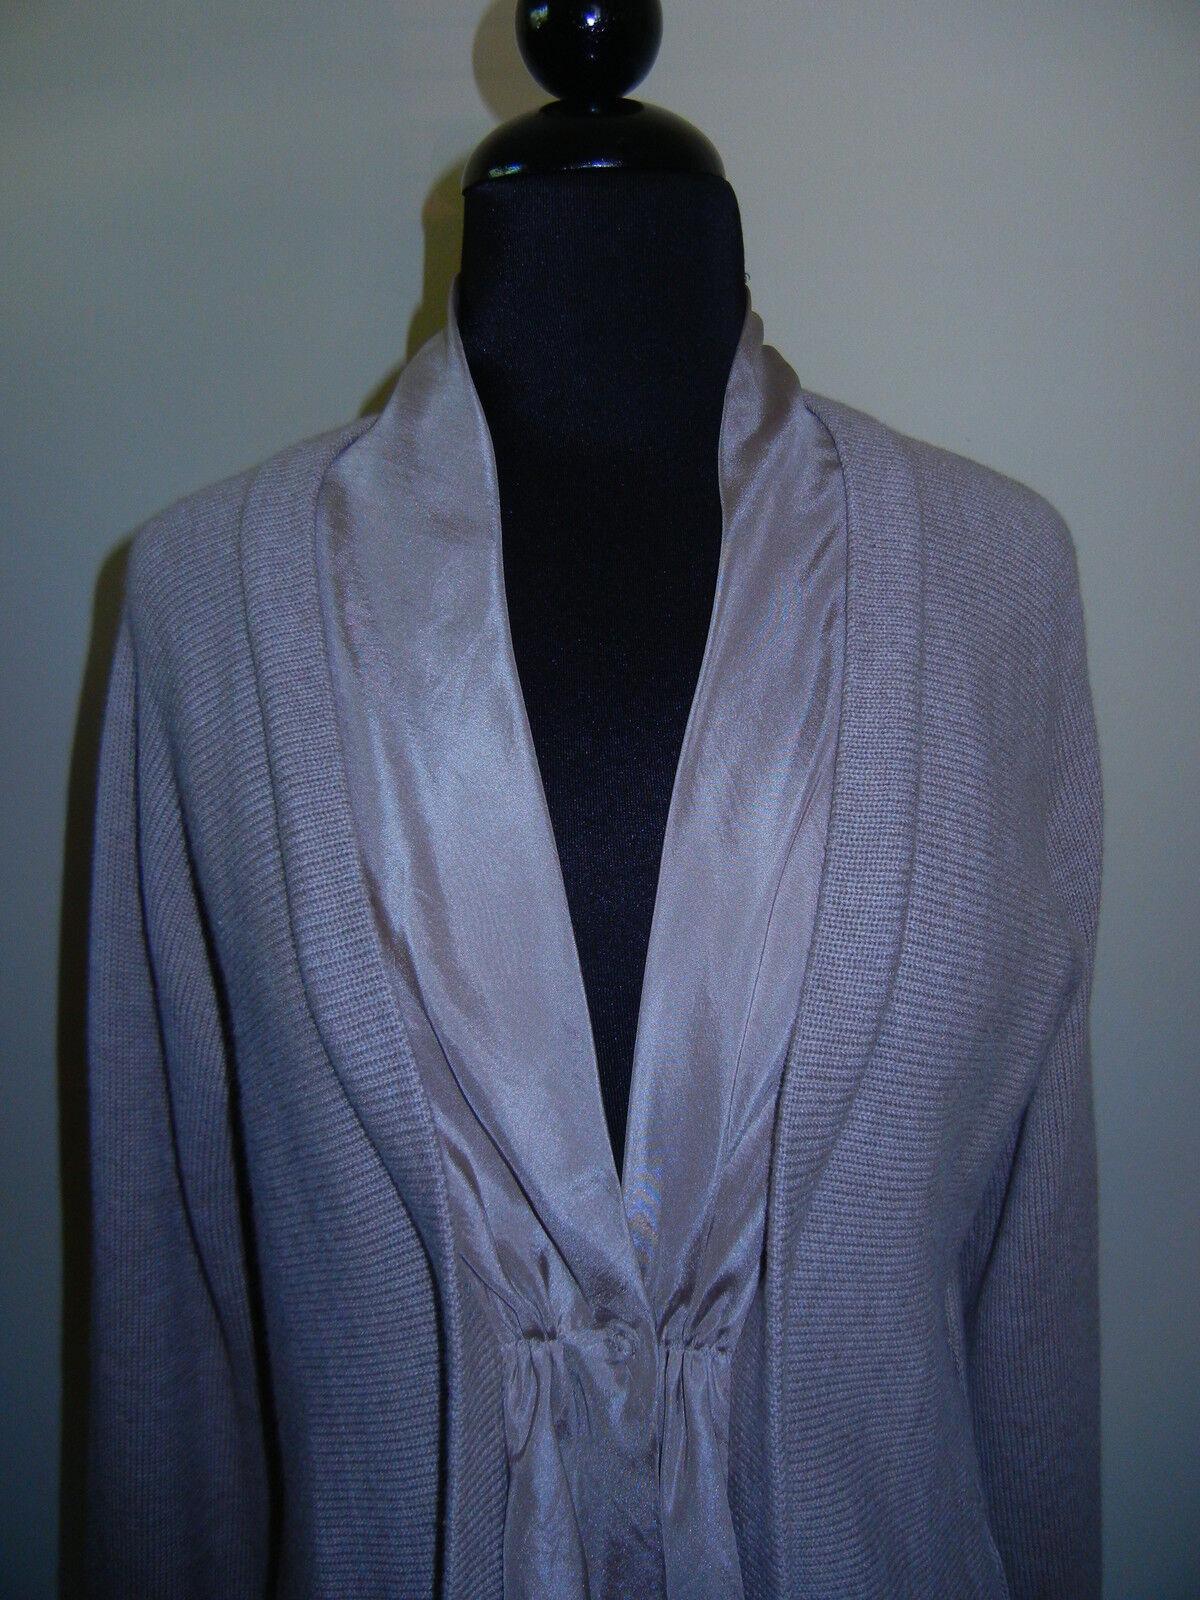 RIVAMONTE Cardigan Sweater Taupe - Perfect -  NWOT Sz   L